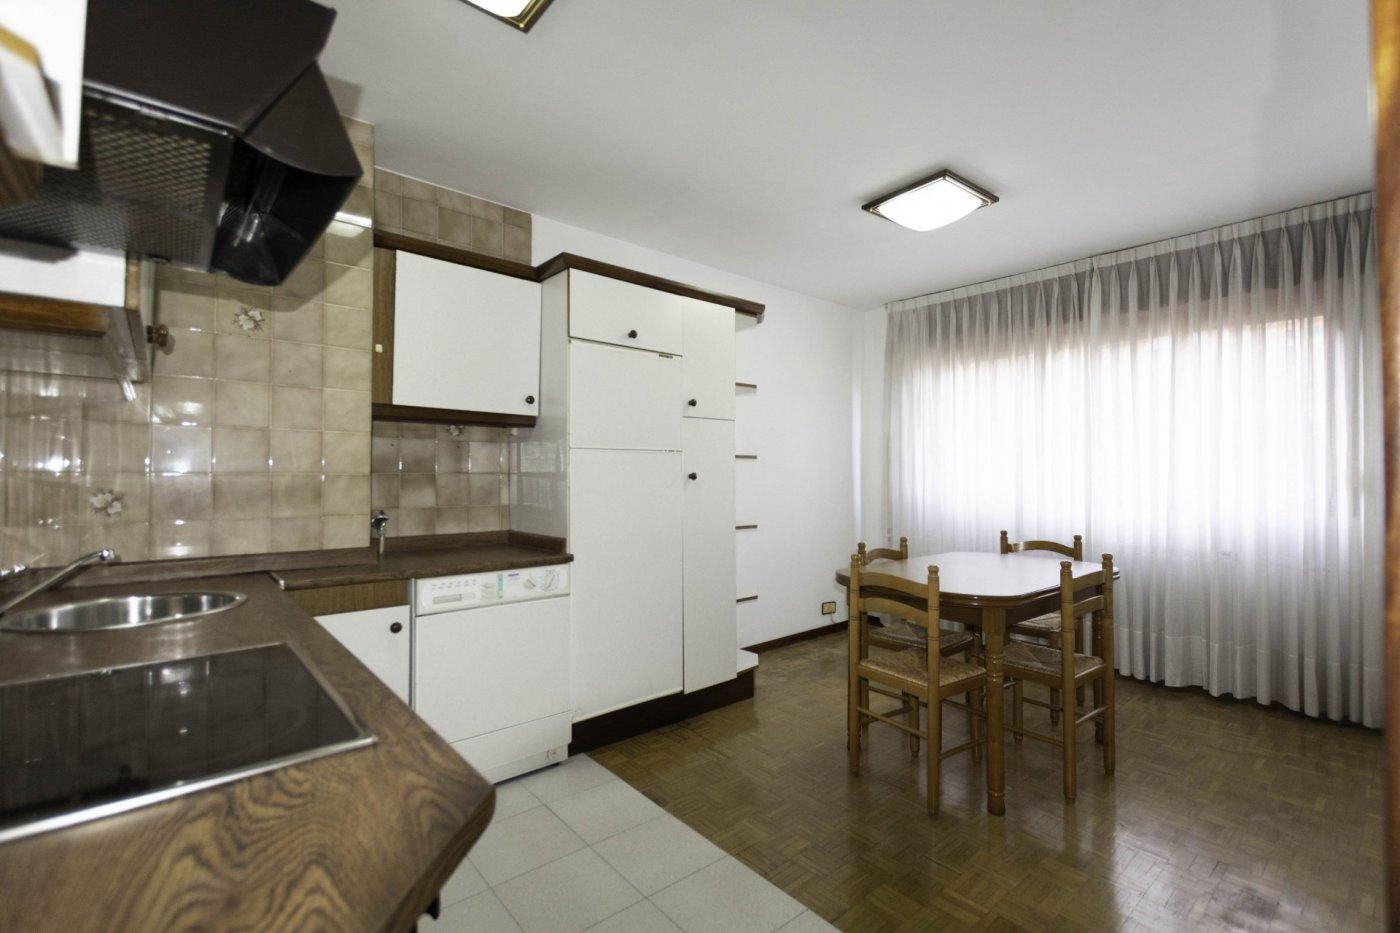 Apartamento en vallobin - imagenInmueble21